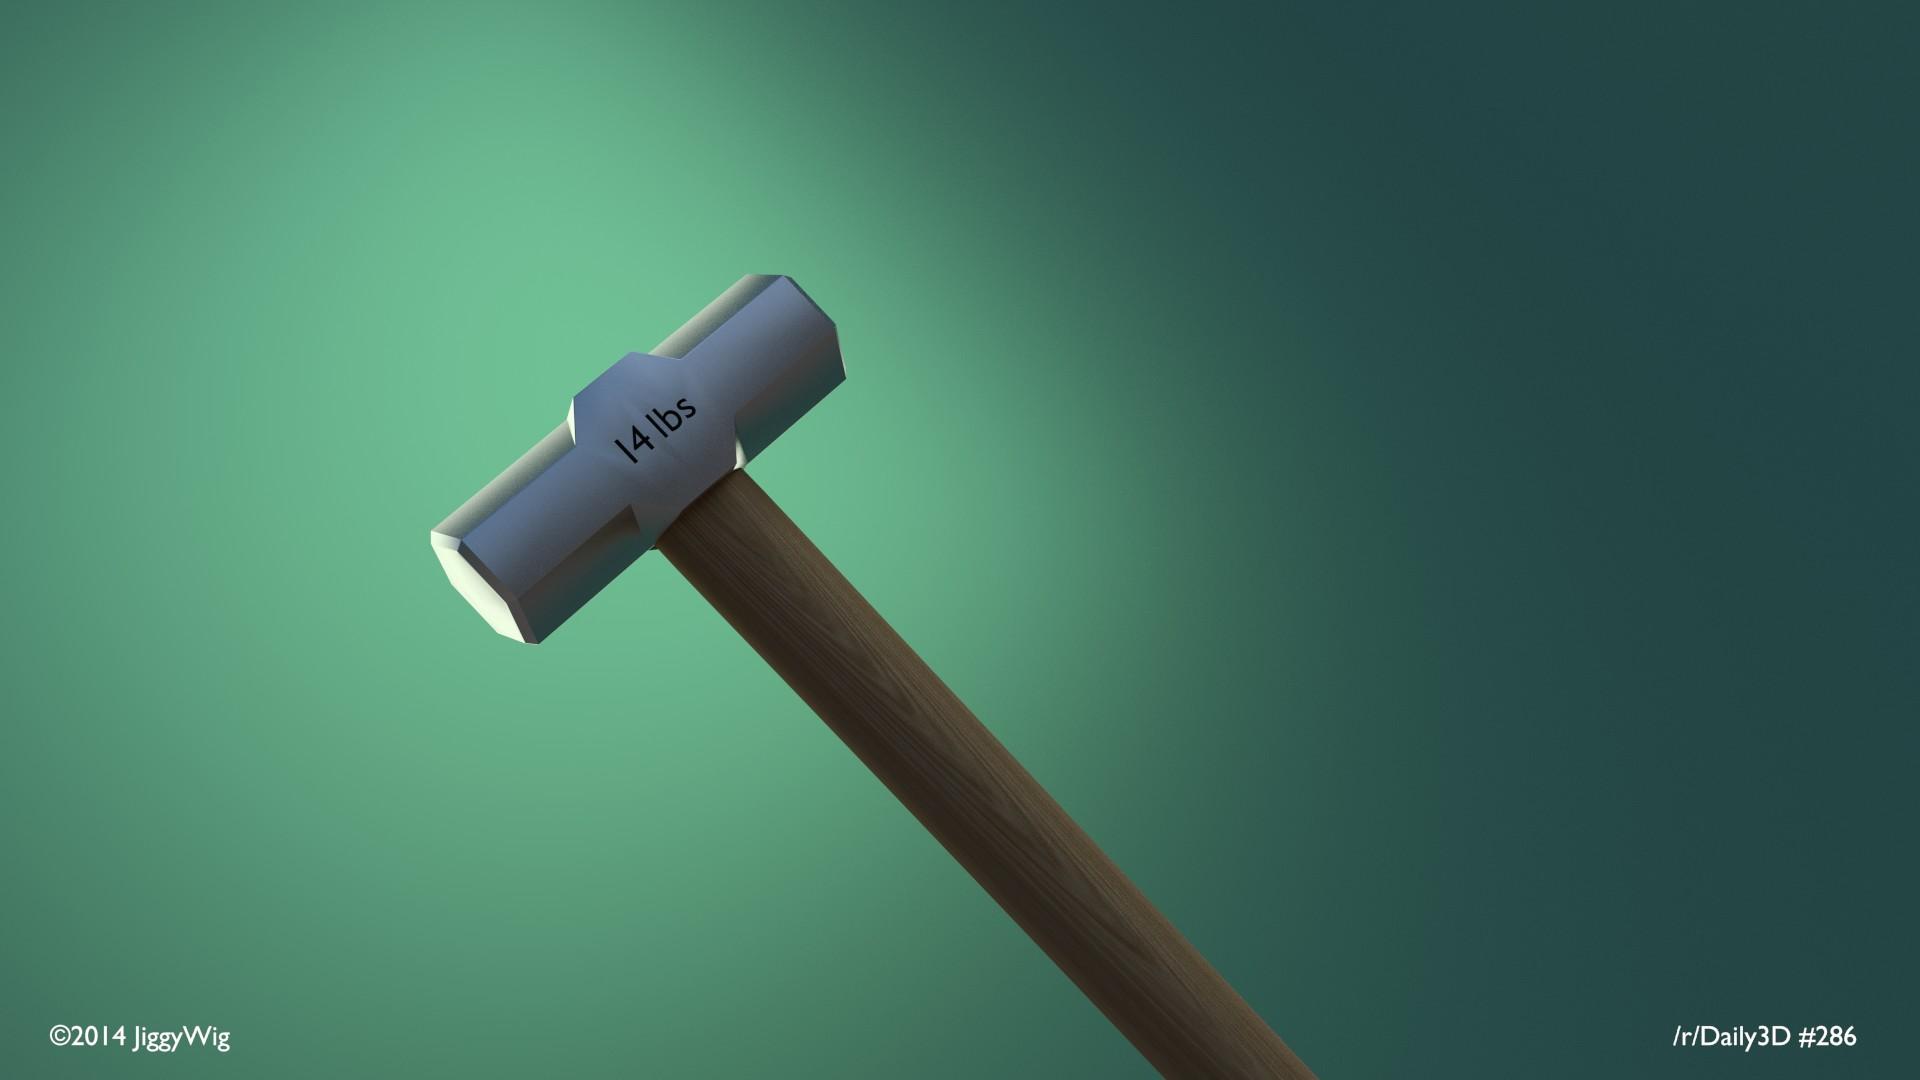 #284 - A big hammer. Nice green.